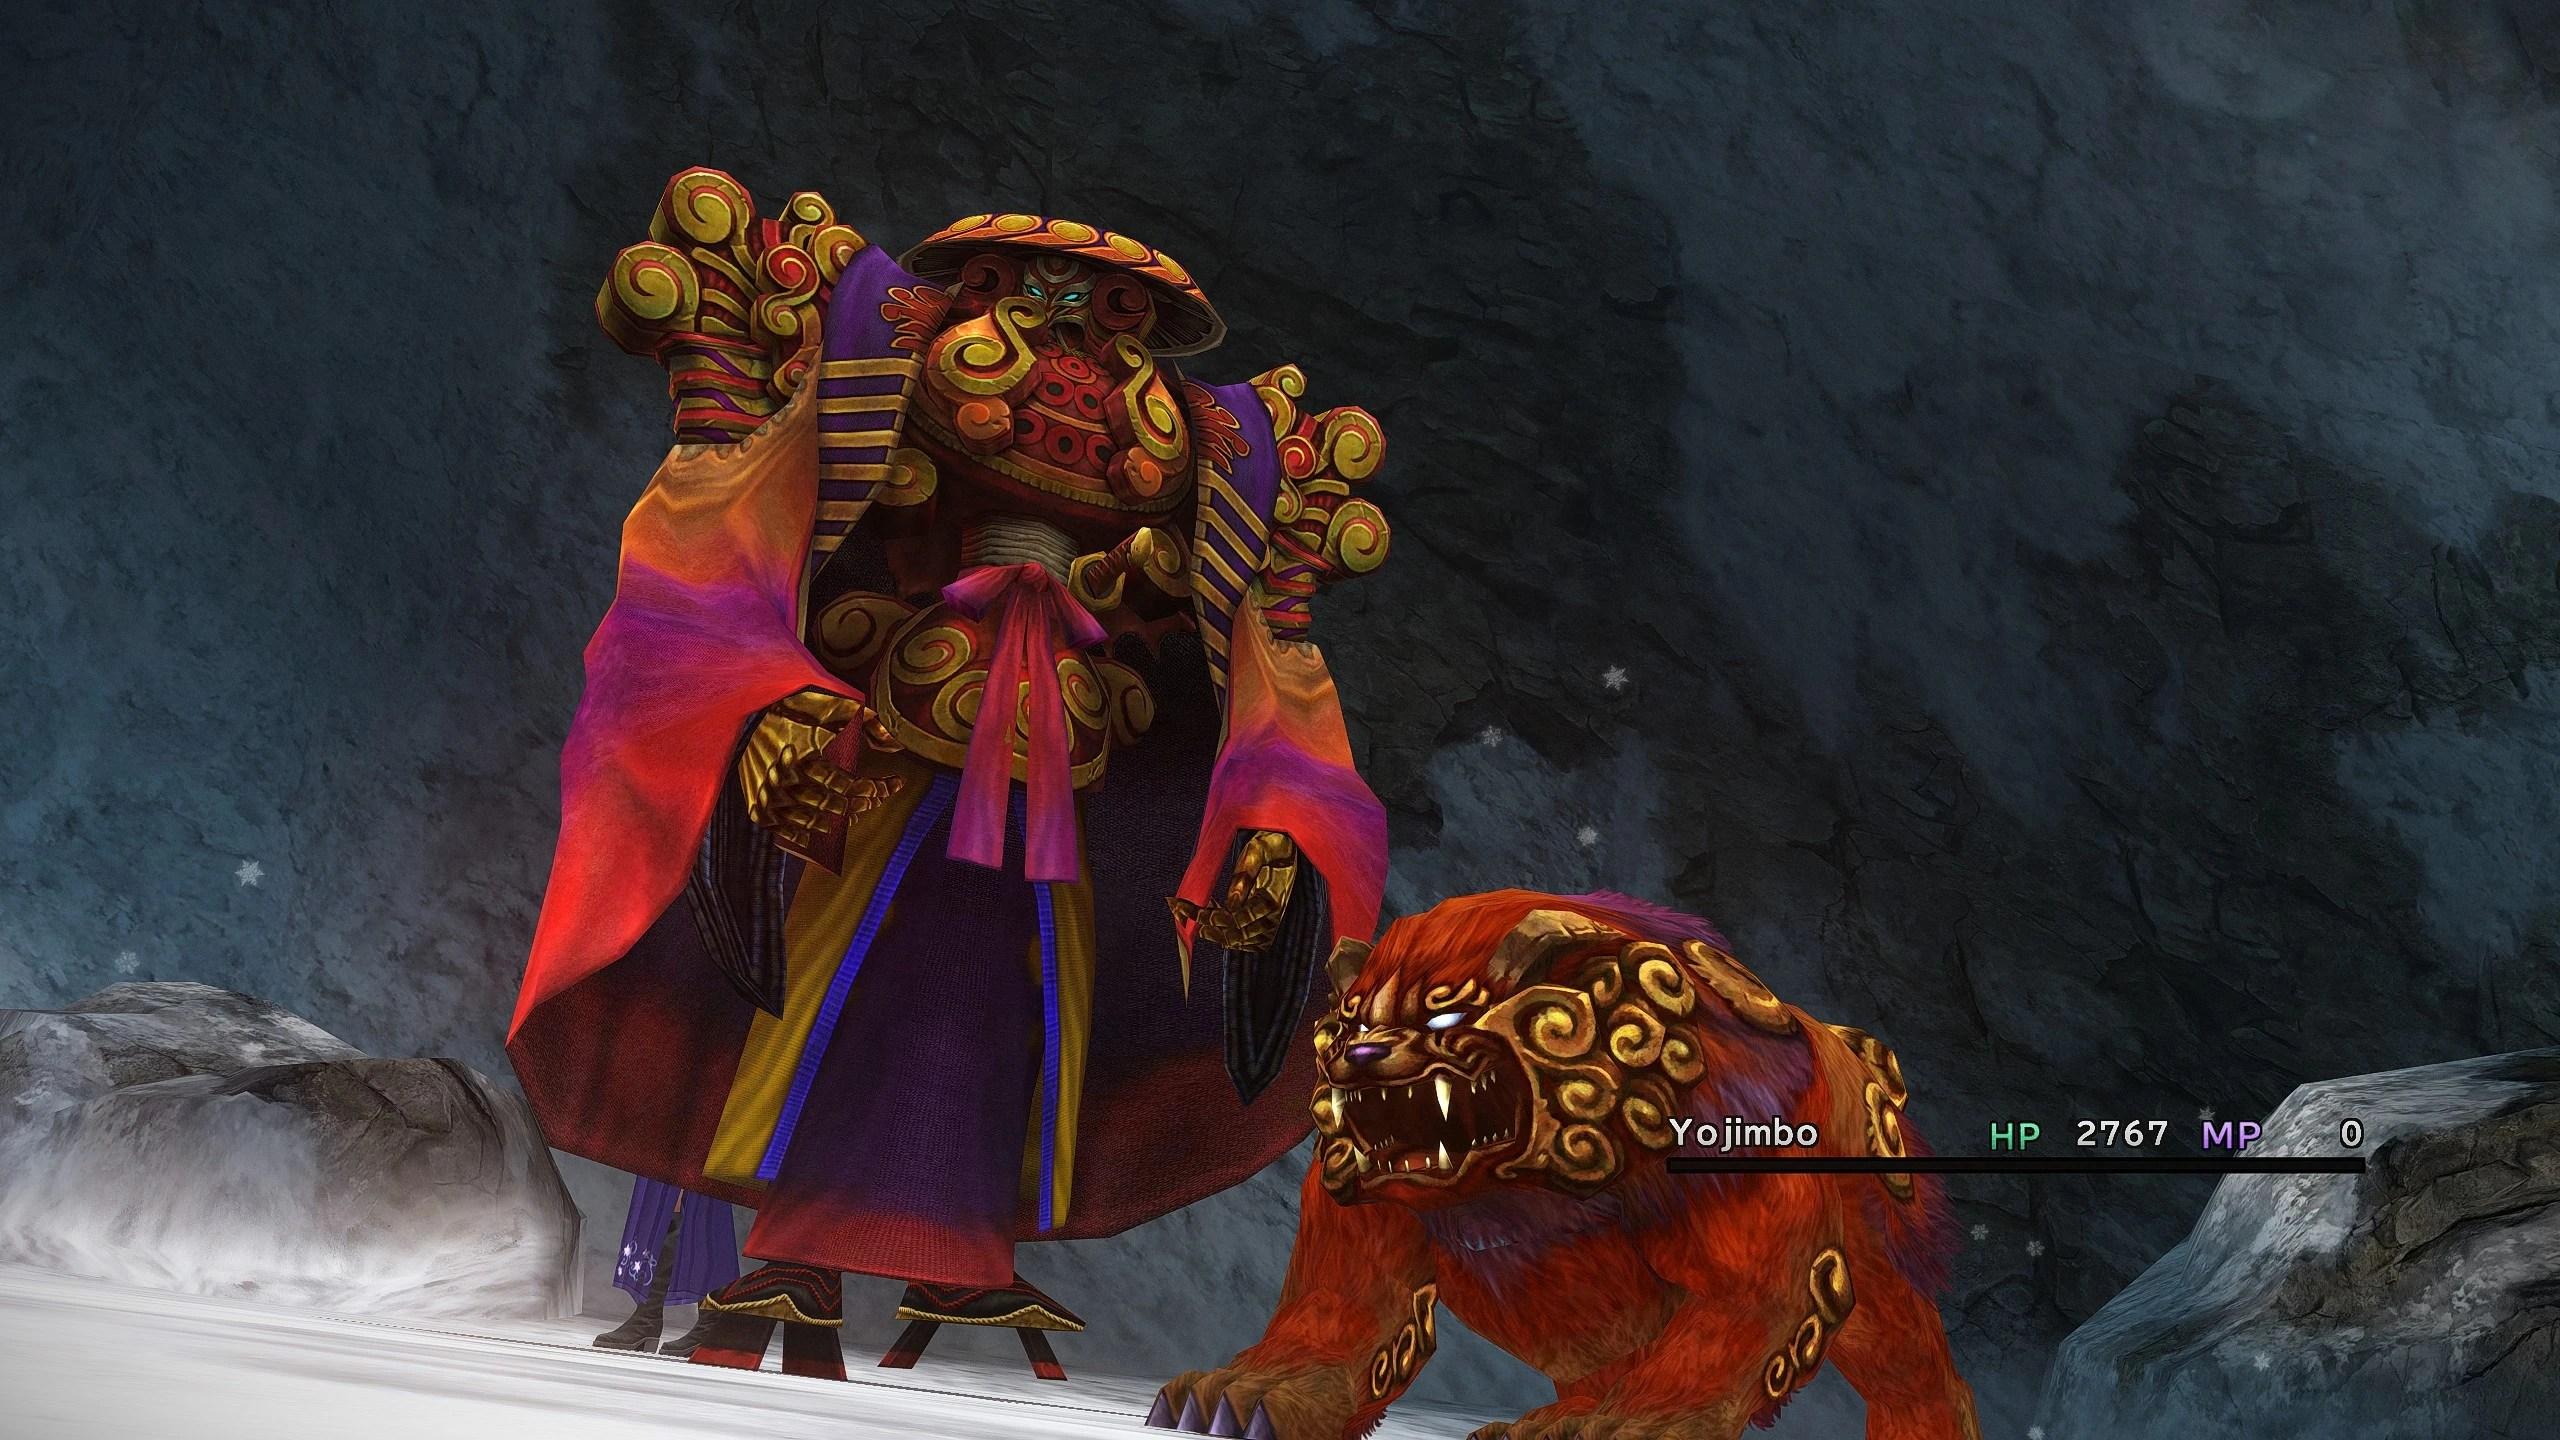 Yojimbo HD Re Texture CDAMJC At Final Fantasy XX 2 HD Remaster Nexus Mods And Community